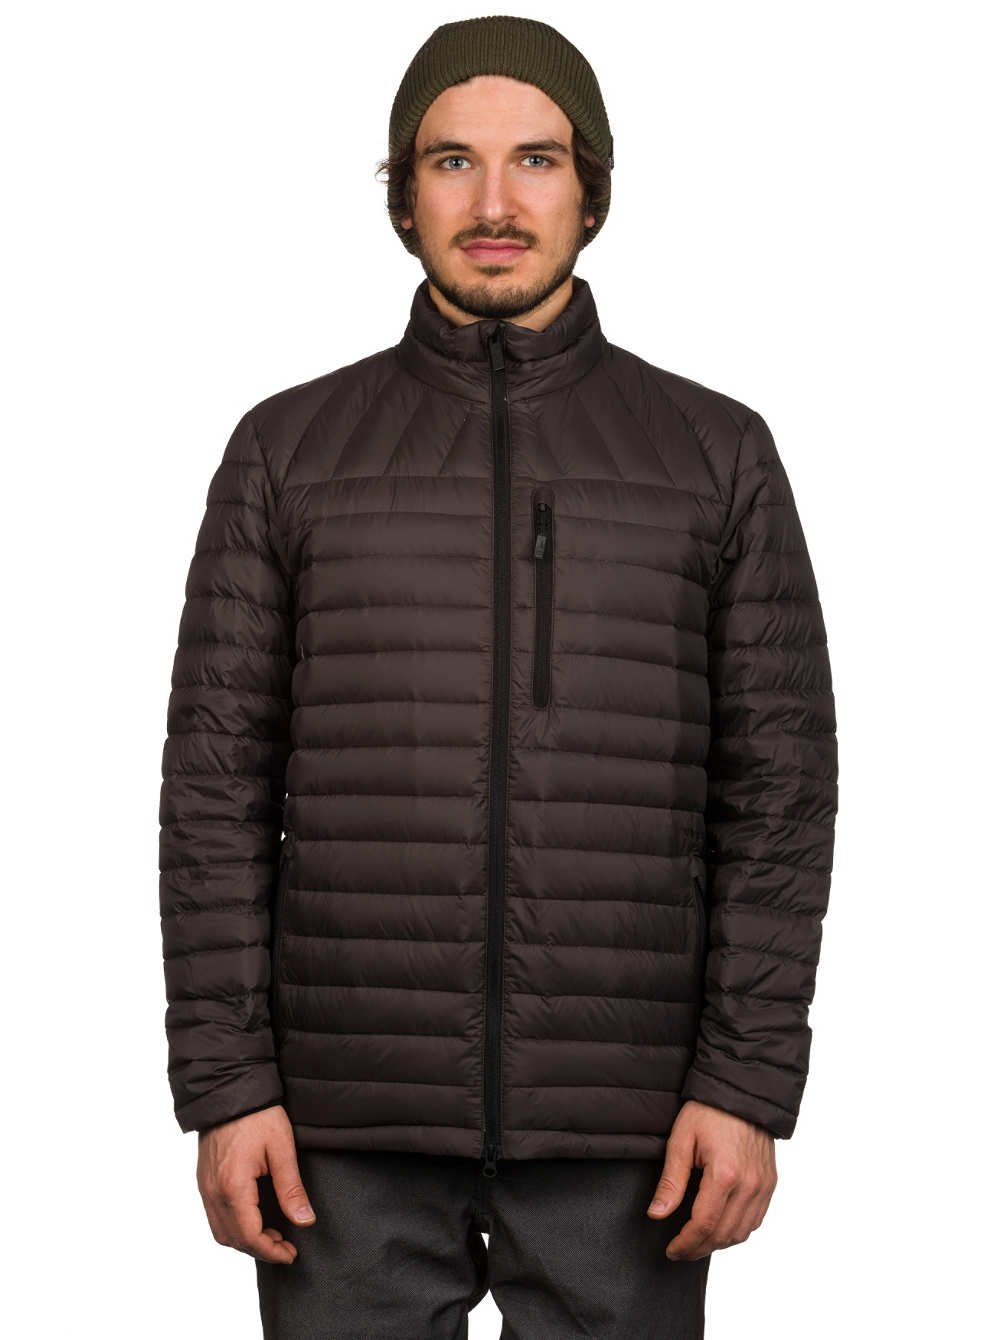 Volcom Snow Men's Puff Puff Give Jacket Vintage Black X-Large